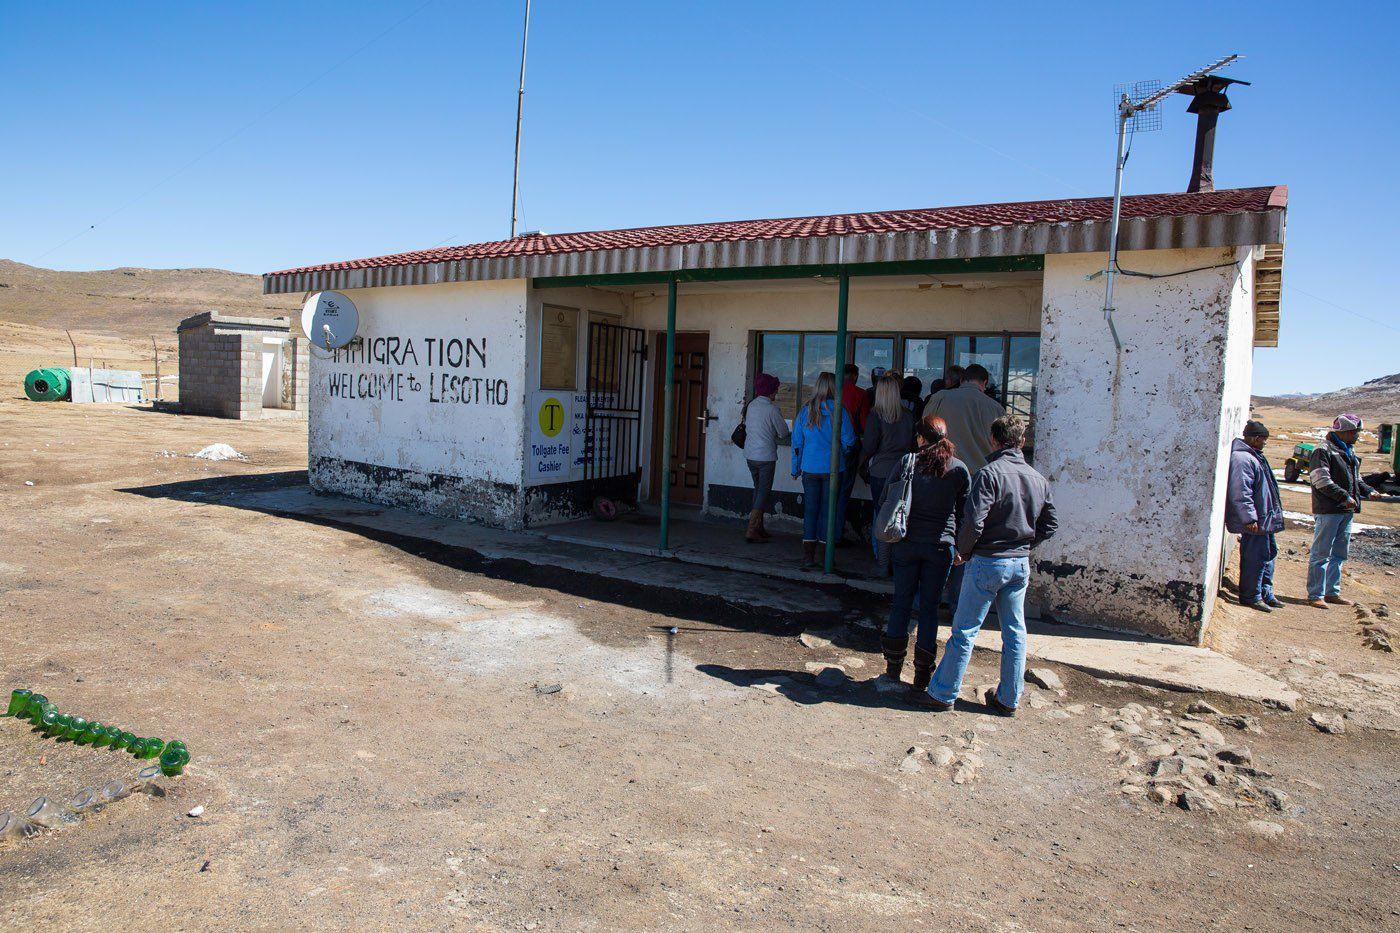 Immigrations Lesotho